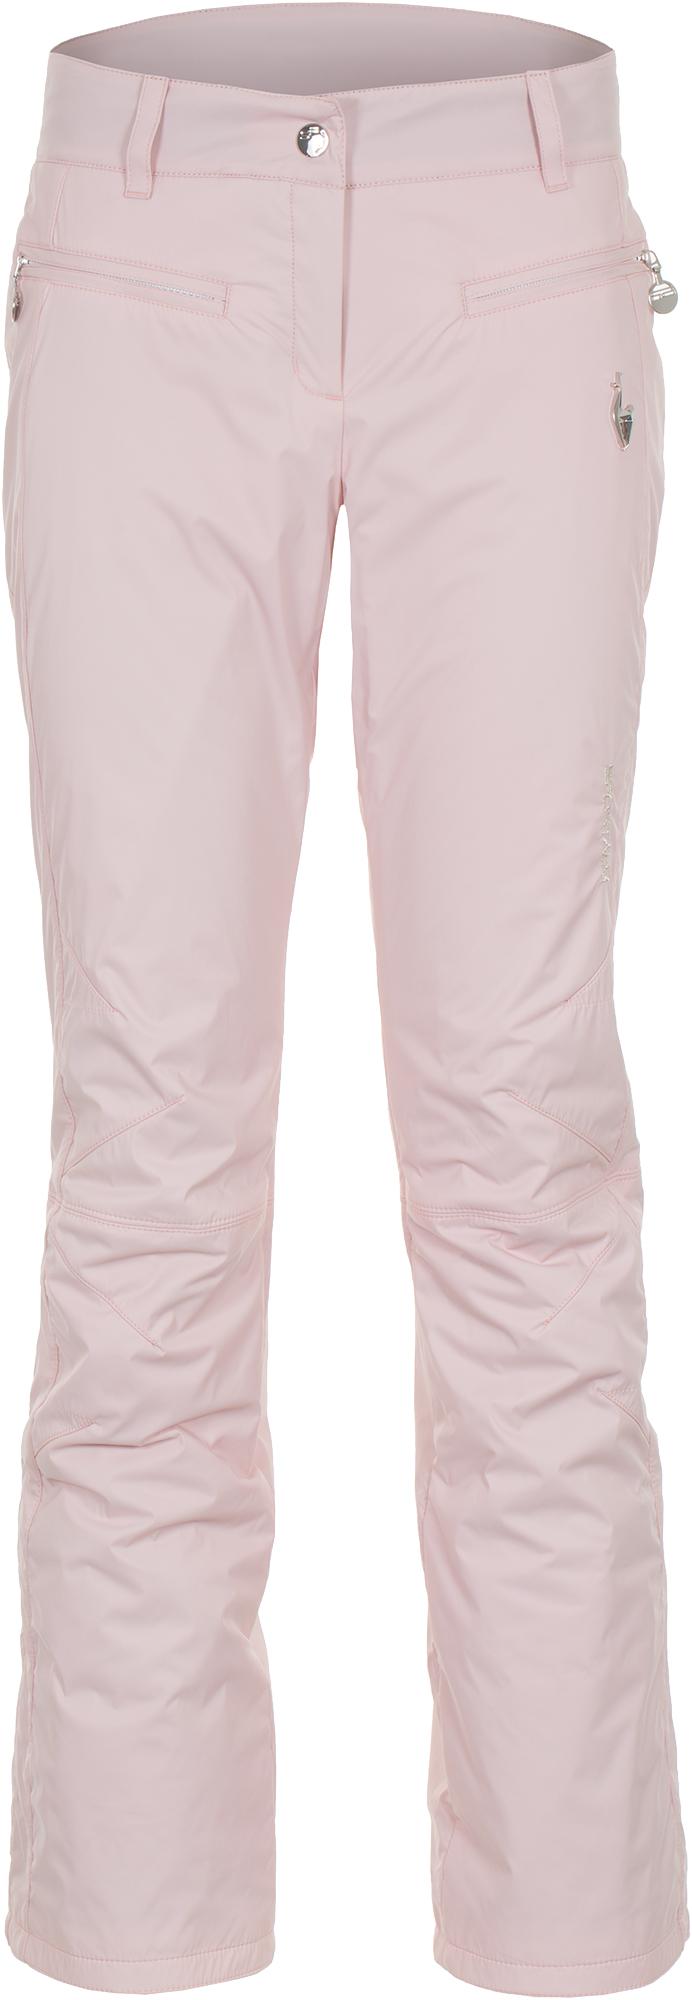 Sportalm Брюки утепленные женские Sportalm Bird TG, размер 48 брюки утепленные женские icepeak цвет темно синий 854020542iv 390 размер 34 40